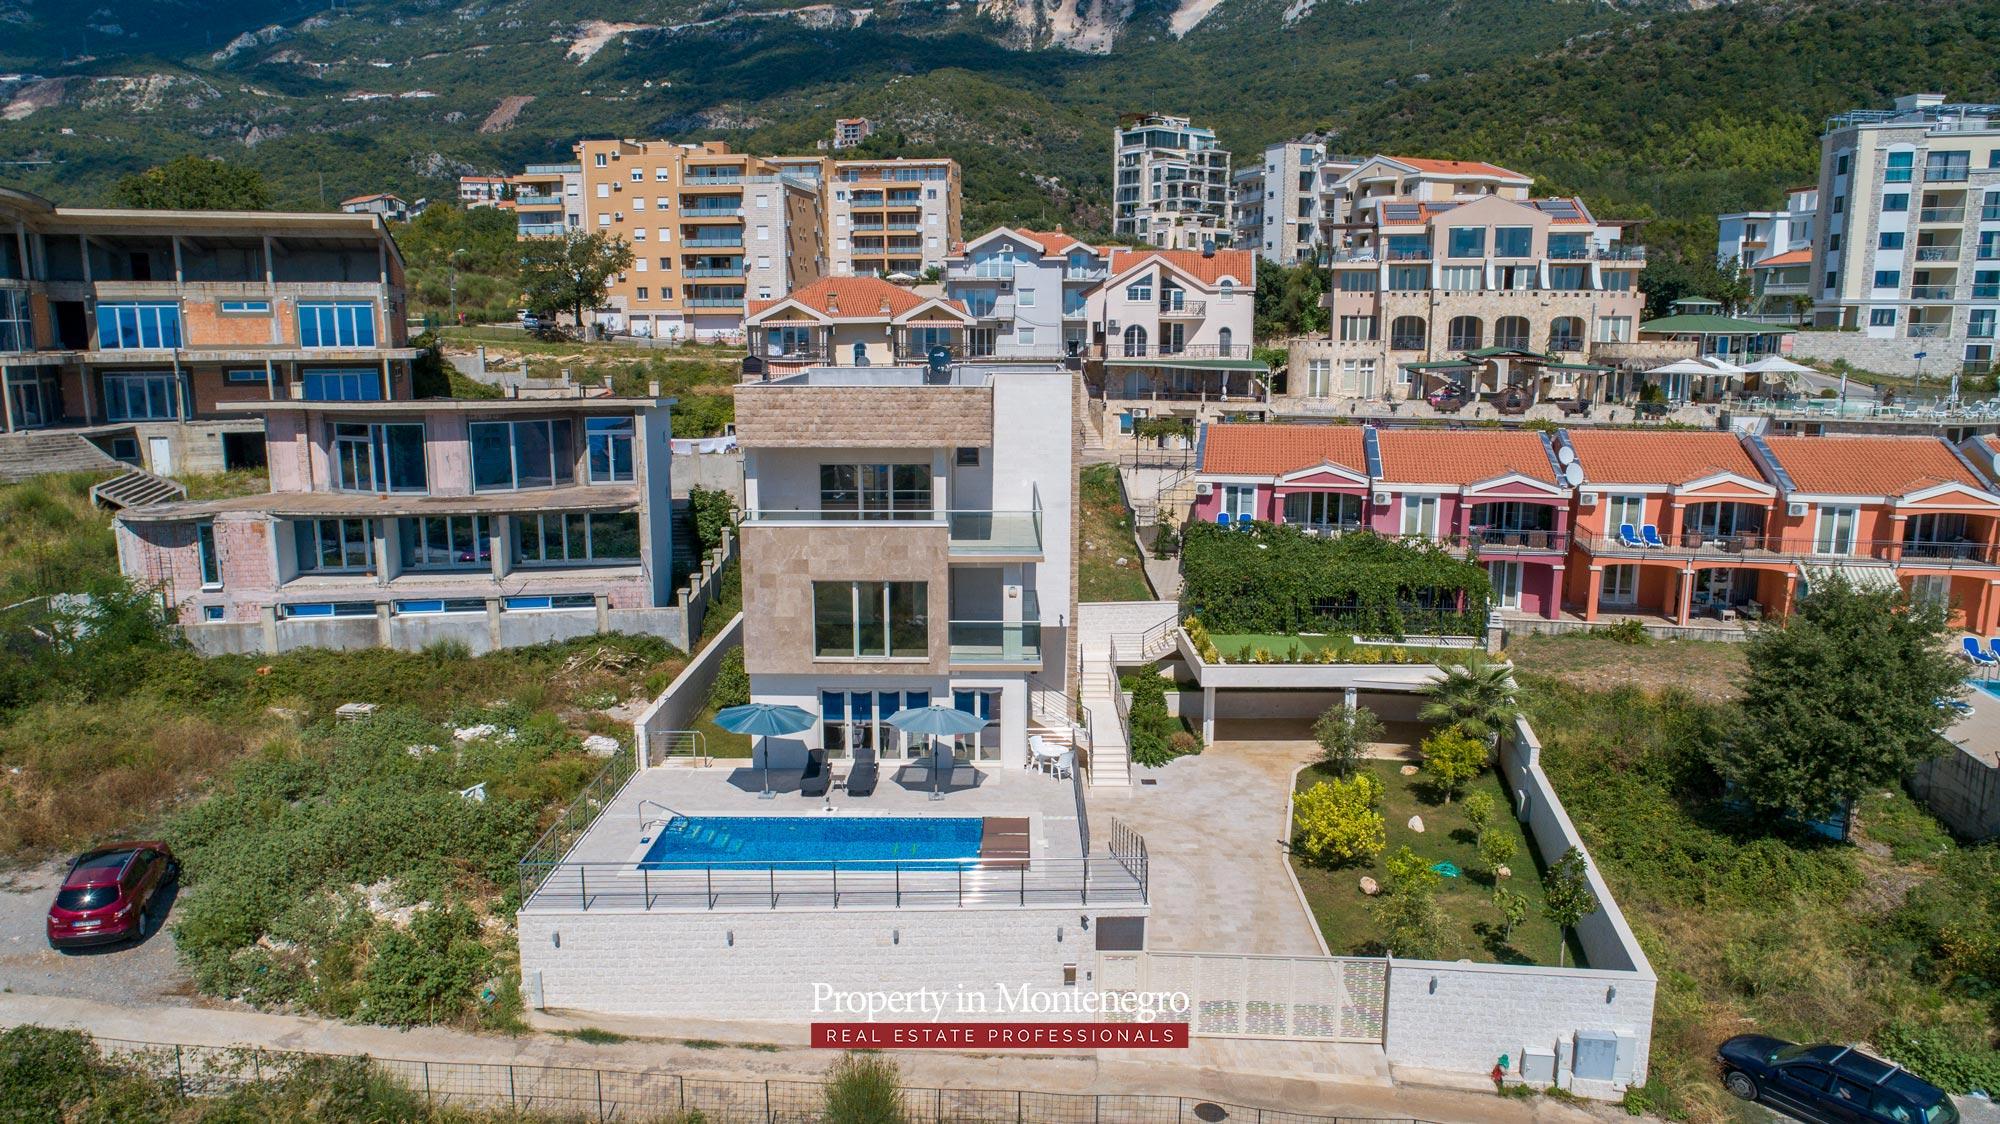 luxury-villa-with-swimming-pool-for-sale-in-Budva (45).jpg